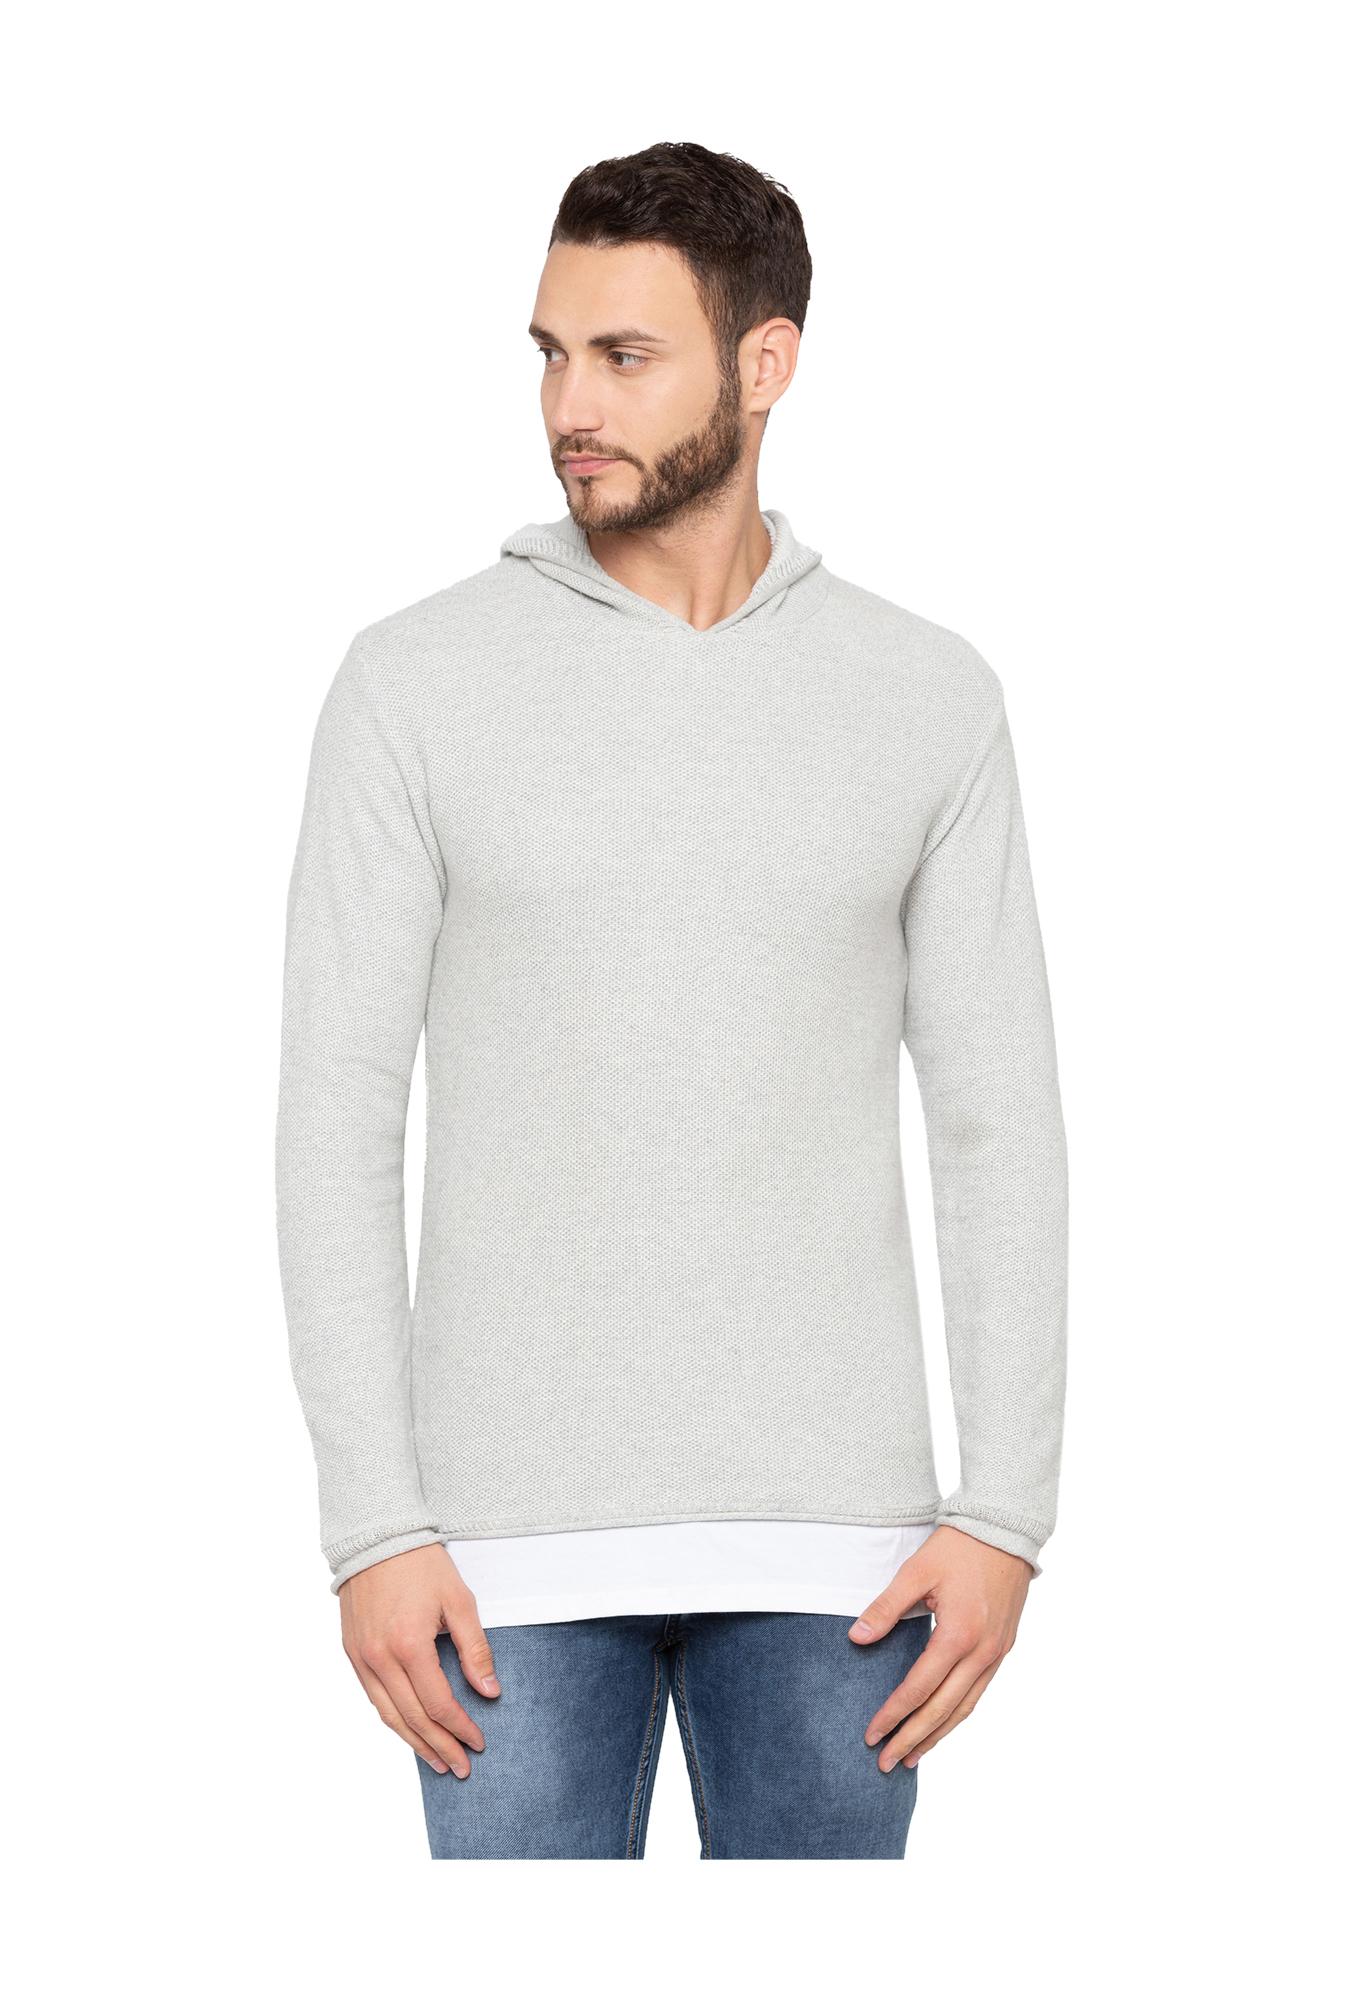 557444f4630 Buy Globus Grey Full Sleeves Sweater for Men Online   Tata CLiQ